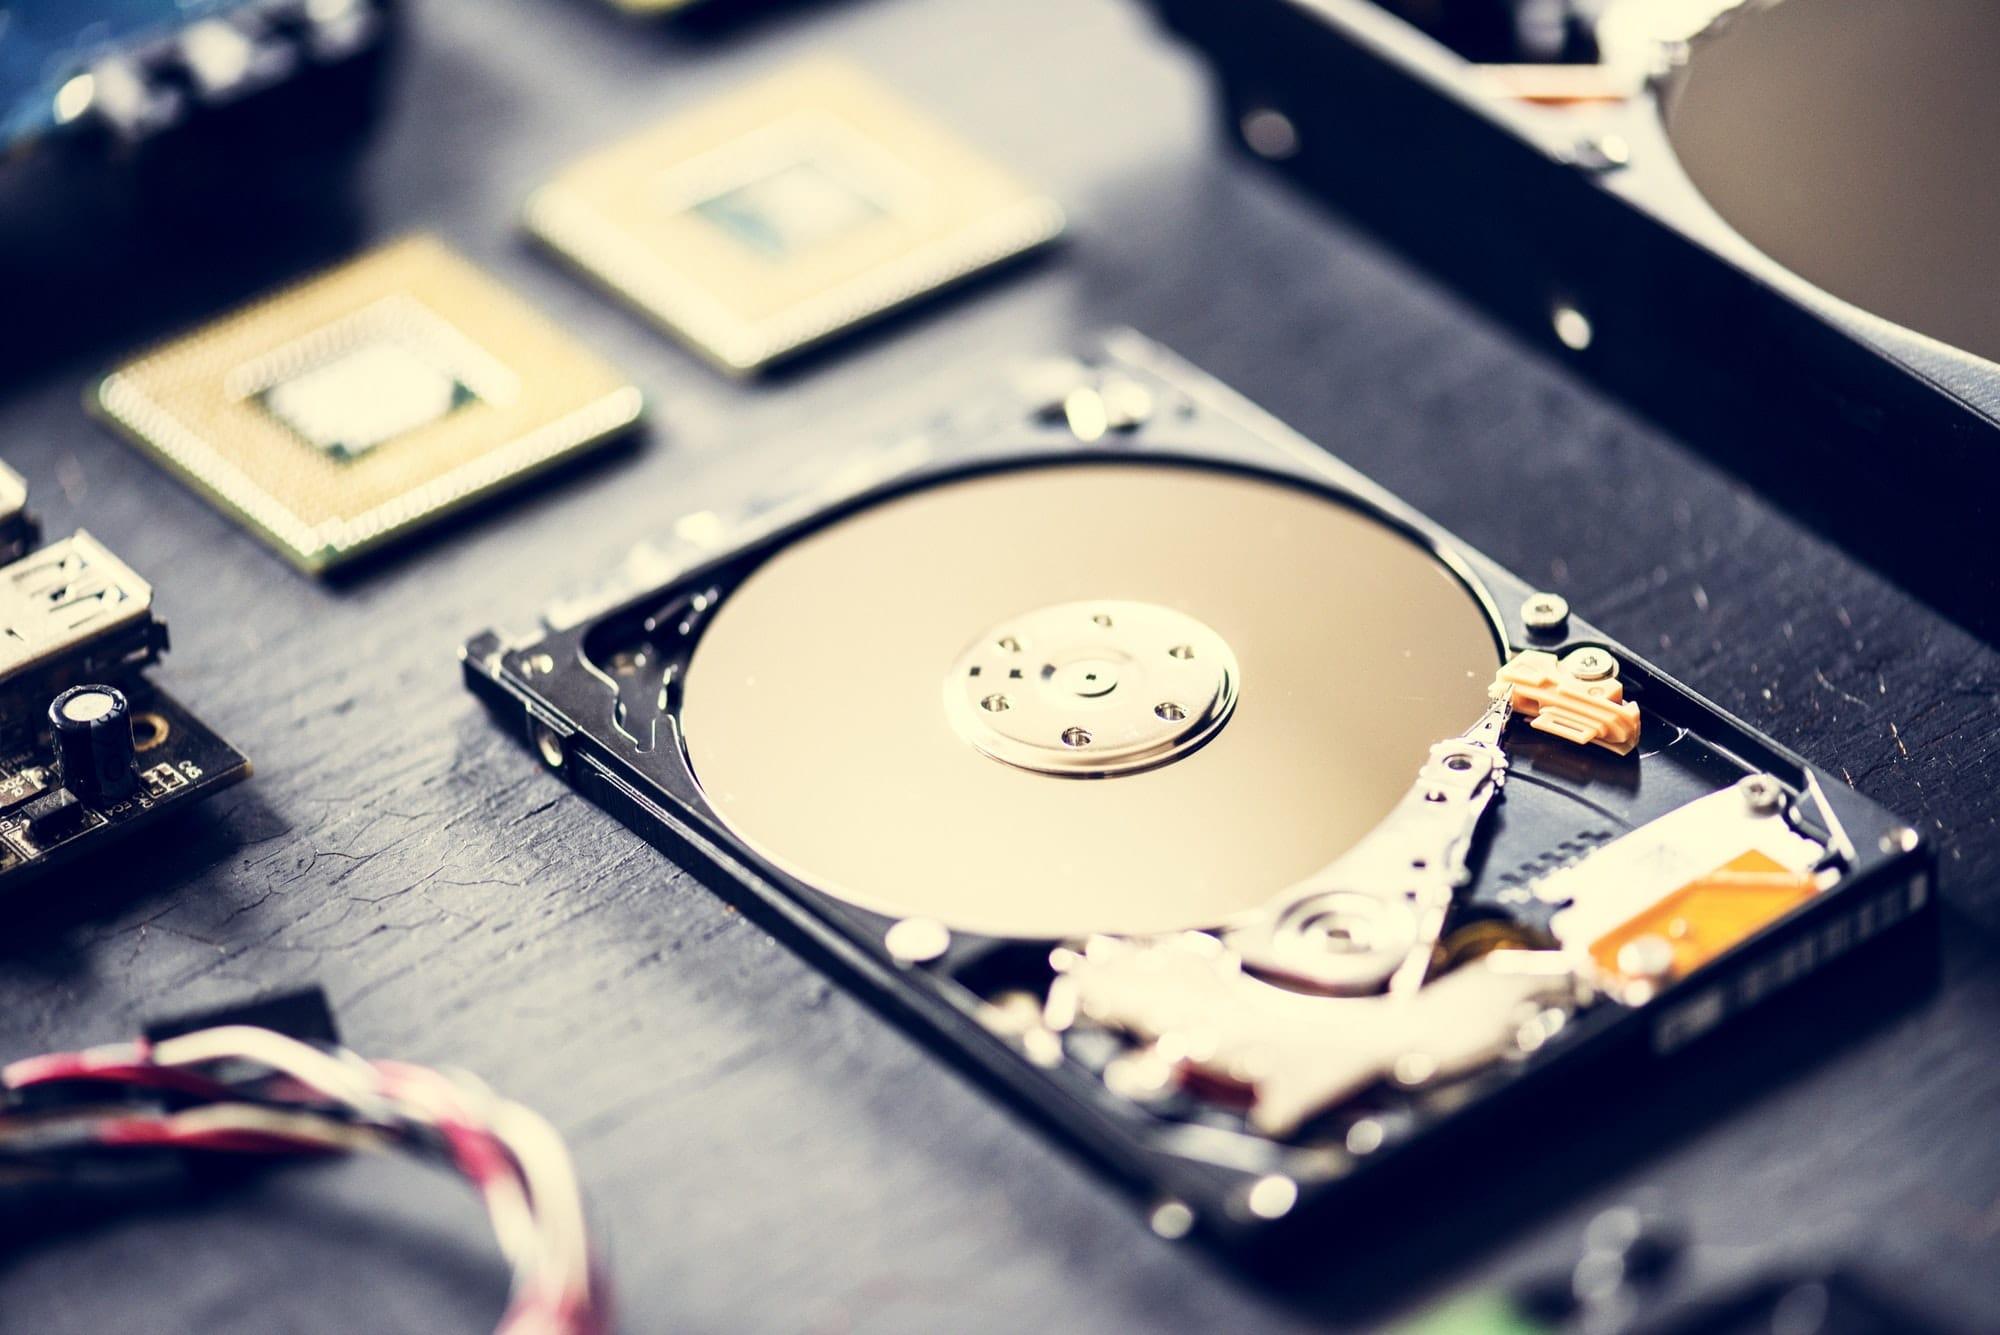 Closeup of computer hard disk drive